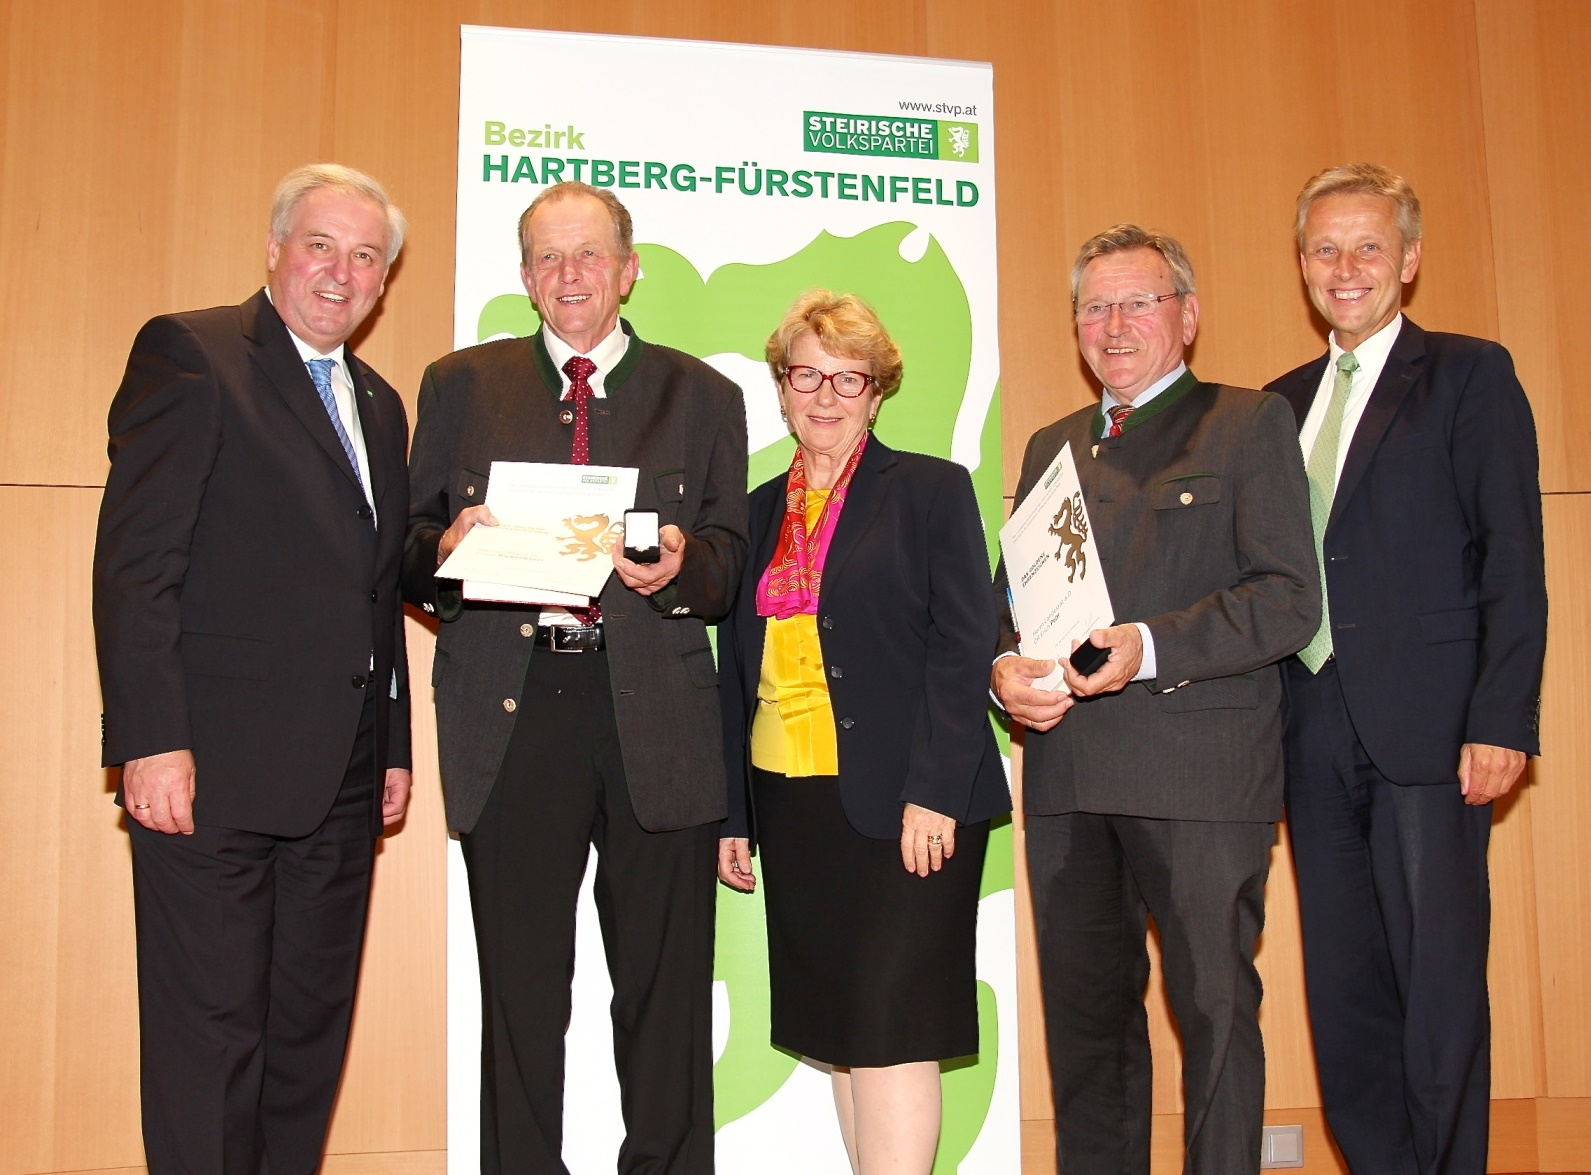 (c) ÖVP Hartberg